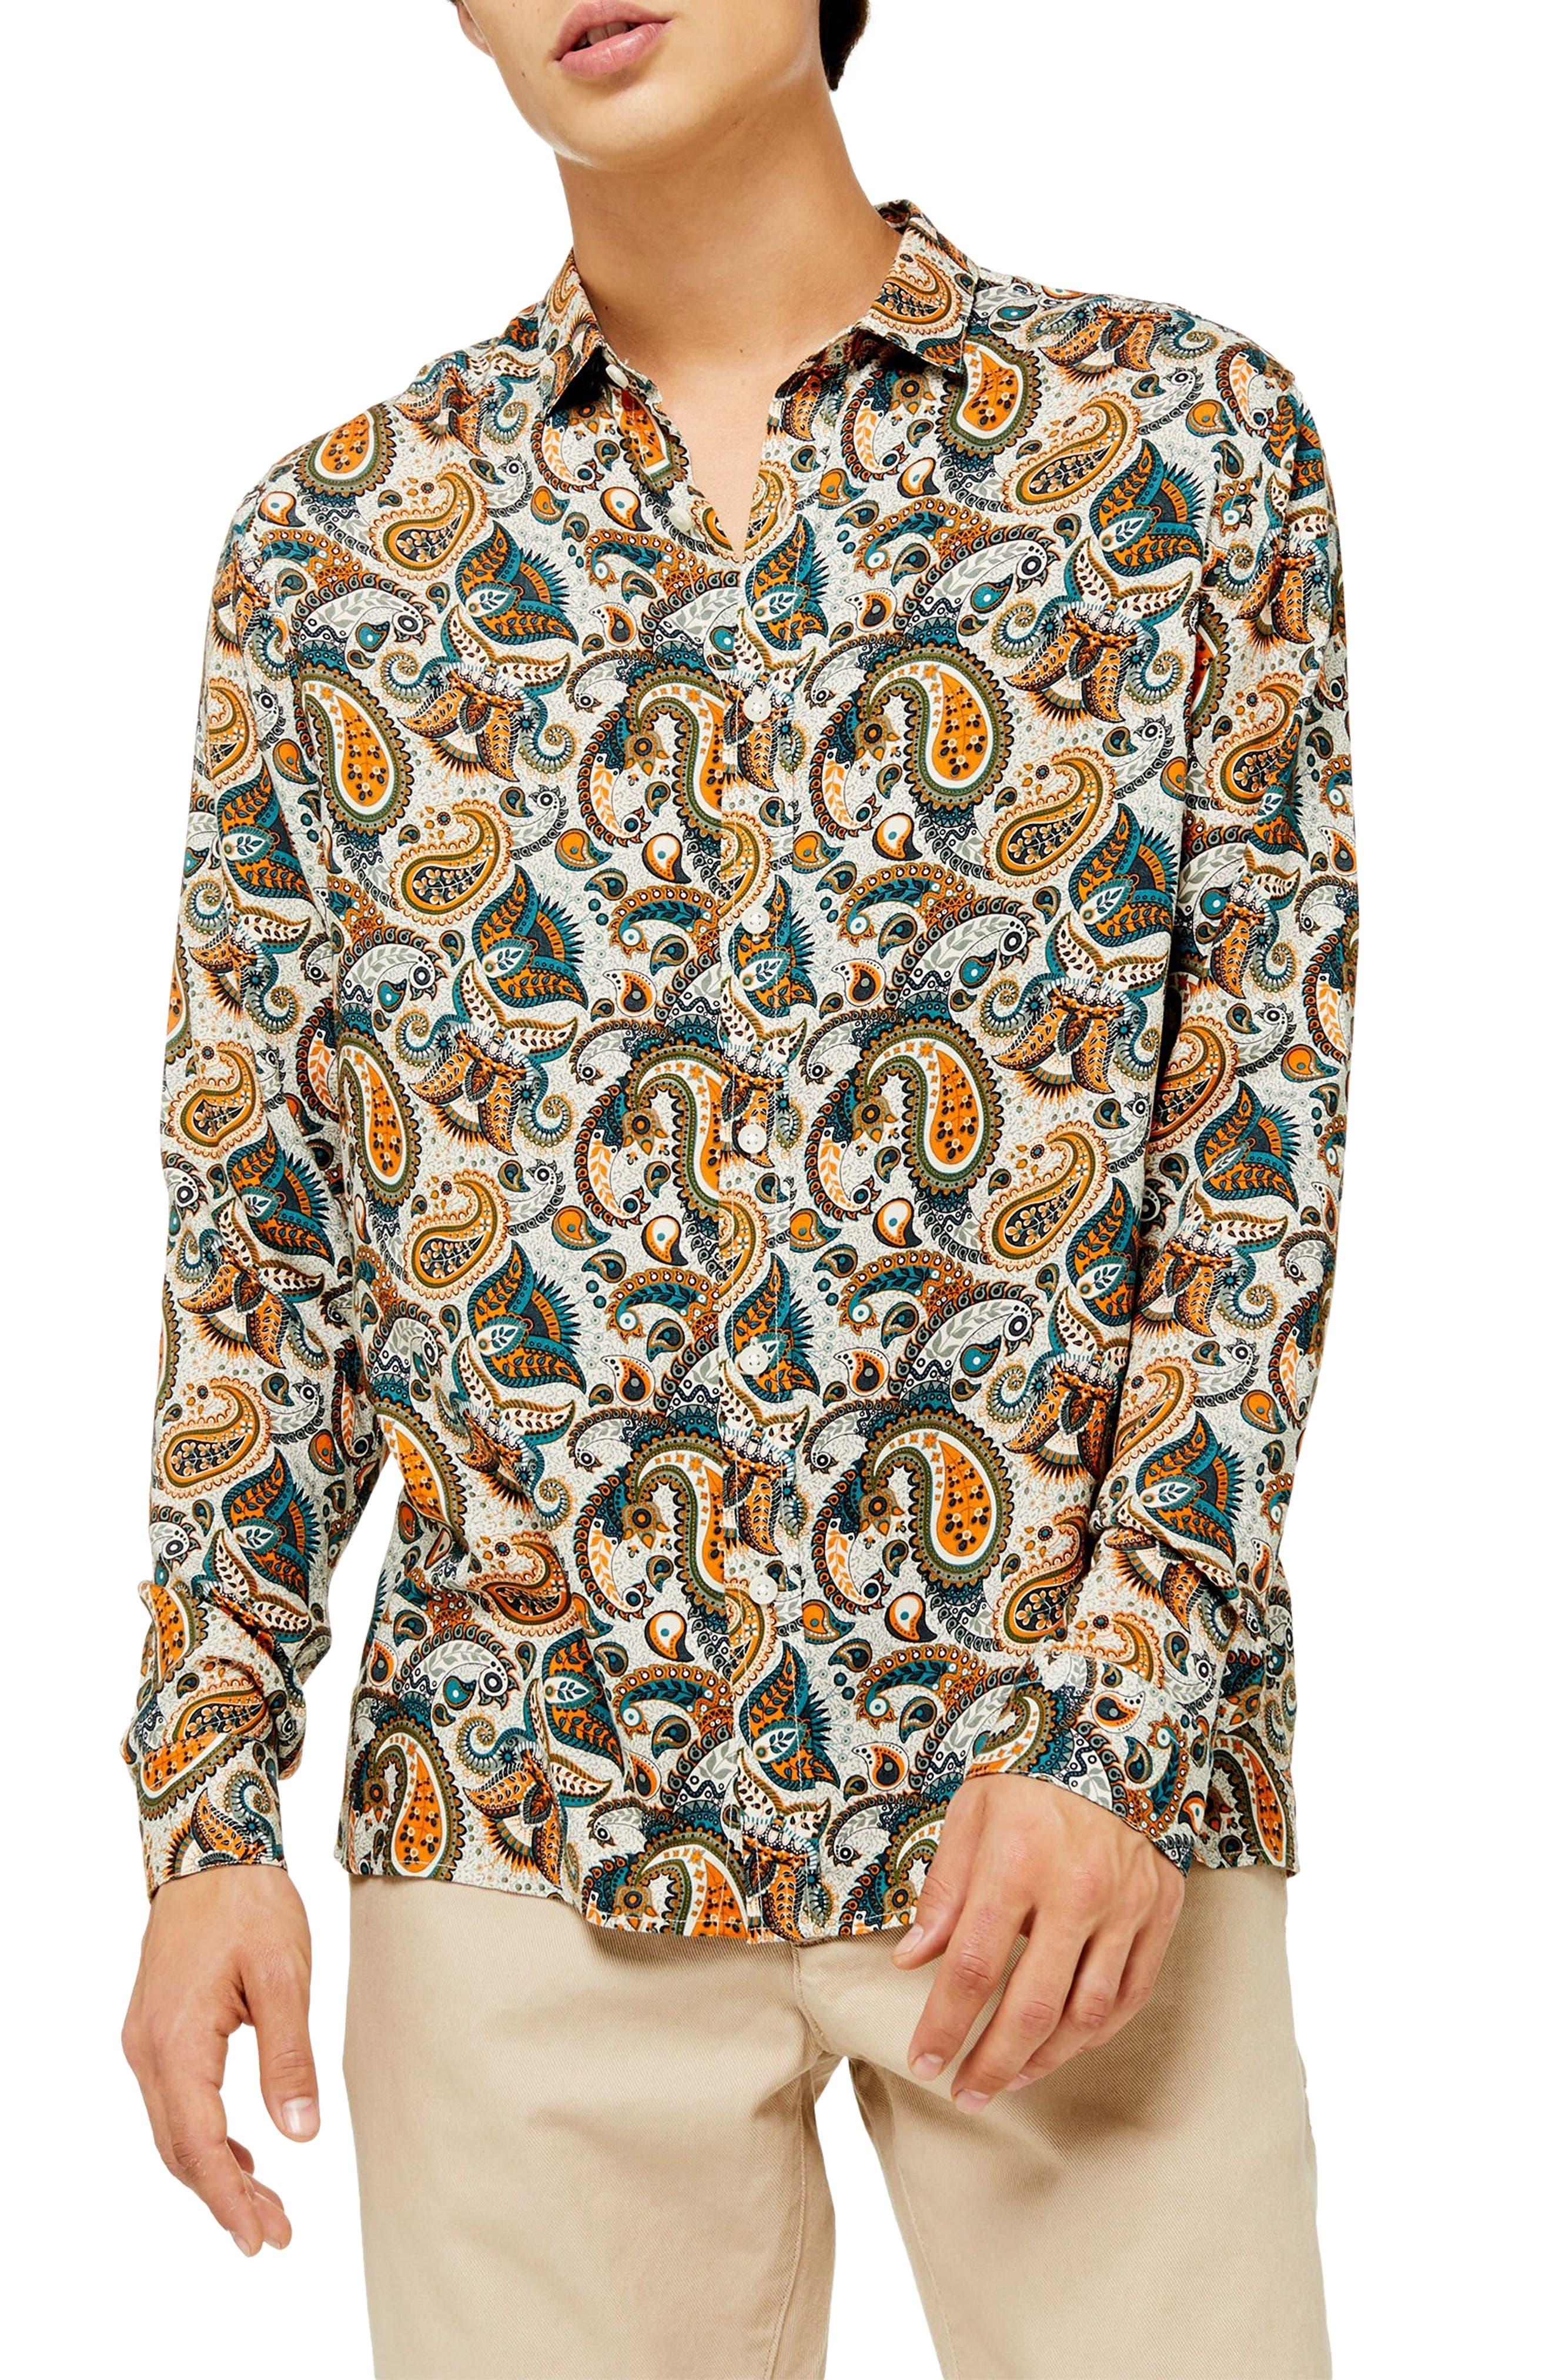 Vintage Shirts – Mens – Retro Shirts Mens Topman Classic Fit Floral Paisley Button-Up Sport Shirt Size X-Small - Green $32.98 AT vintagedancer.com